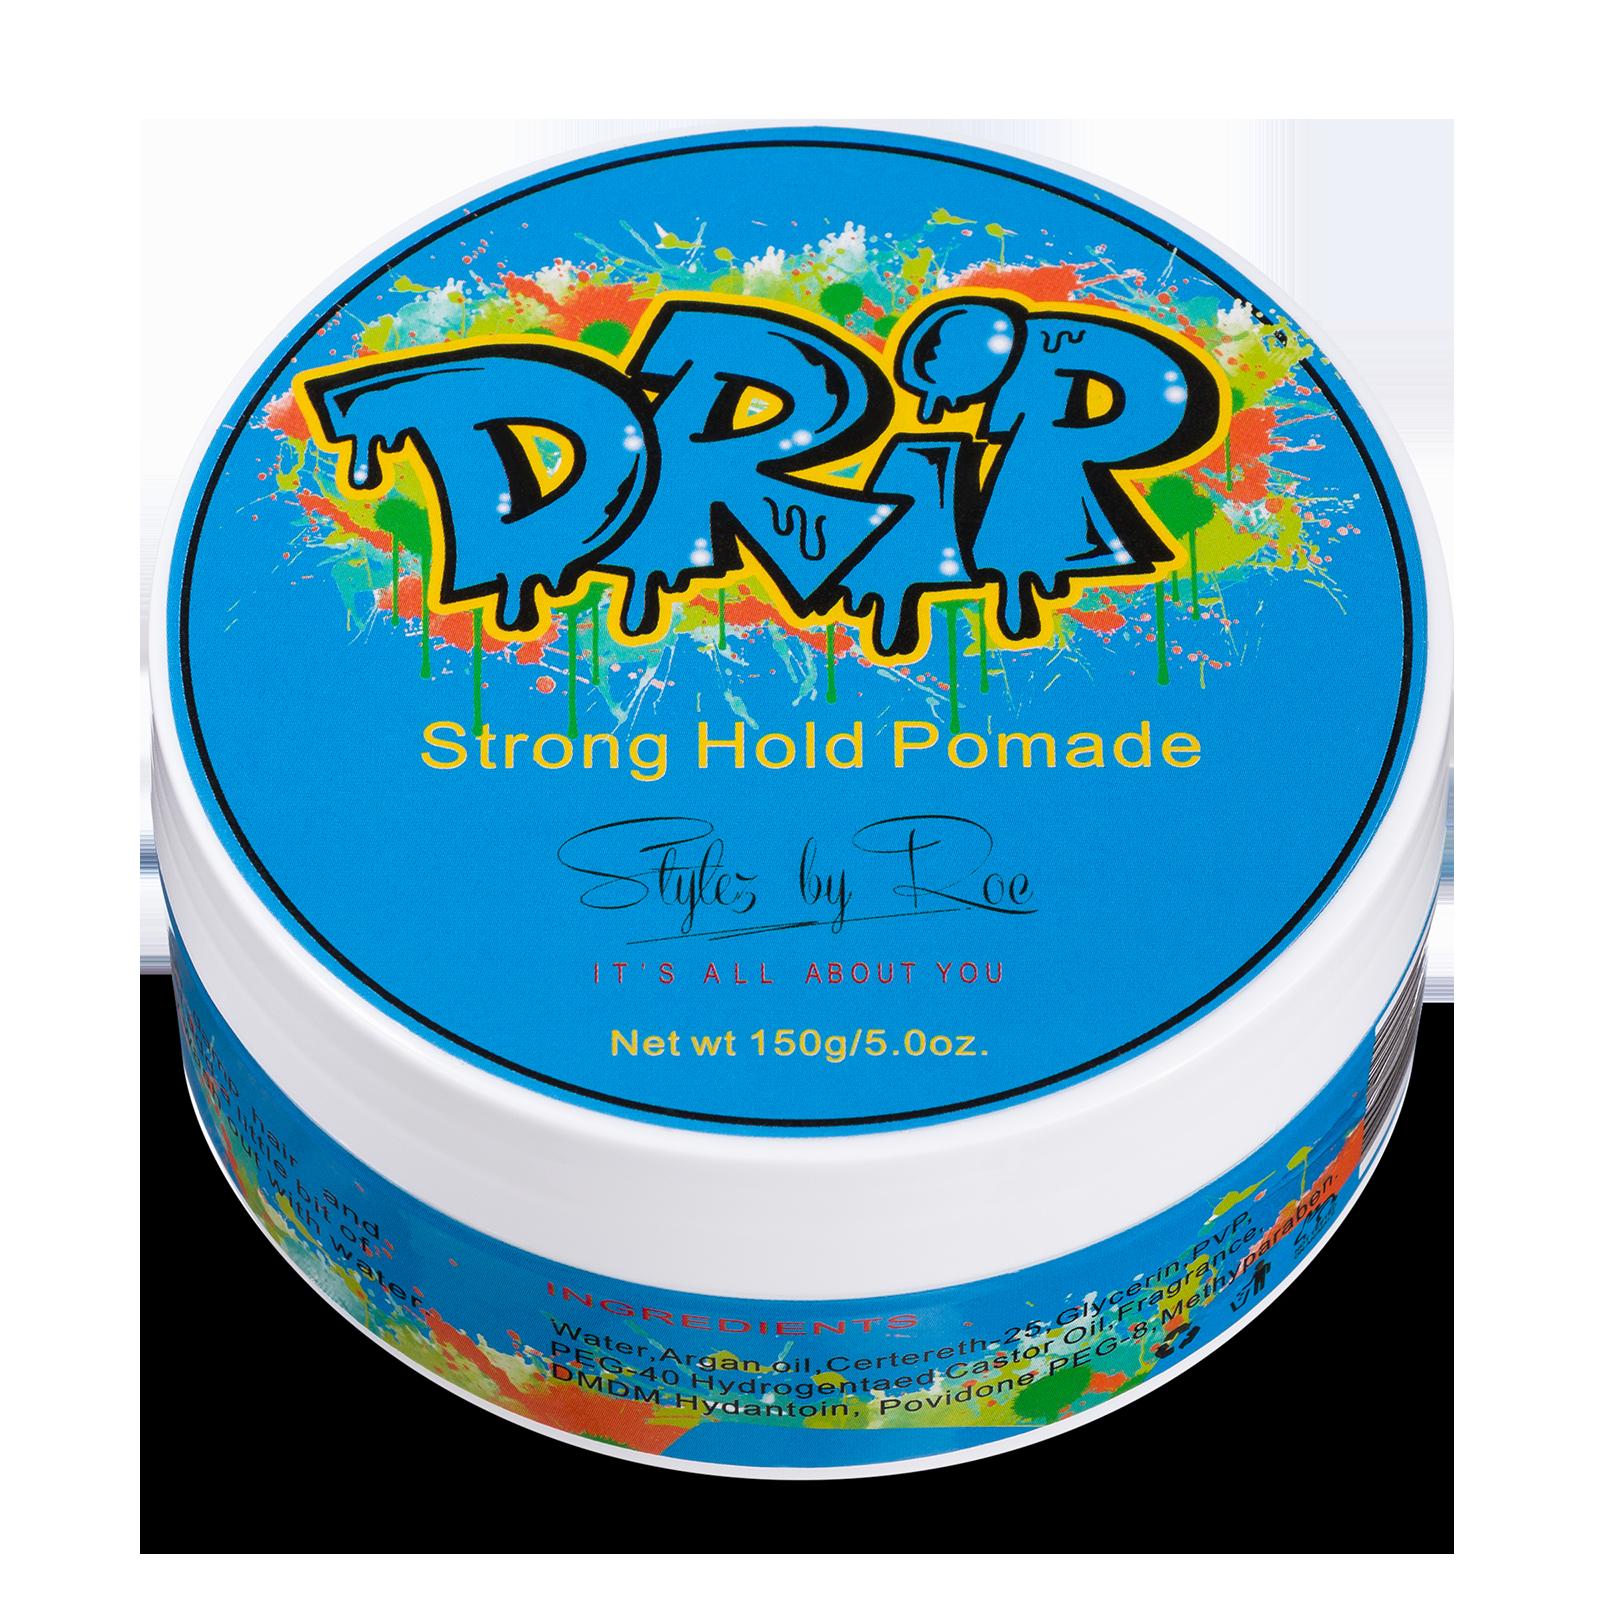 Pomade product image